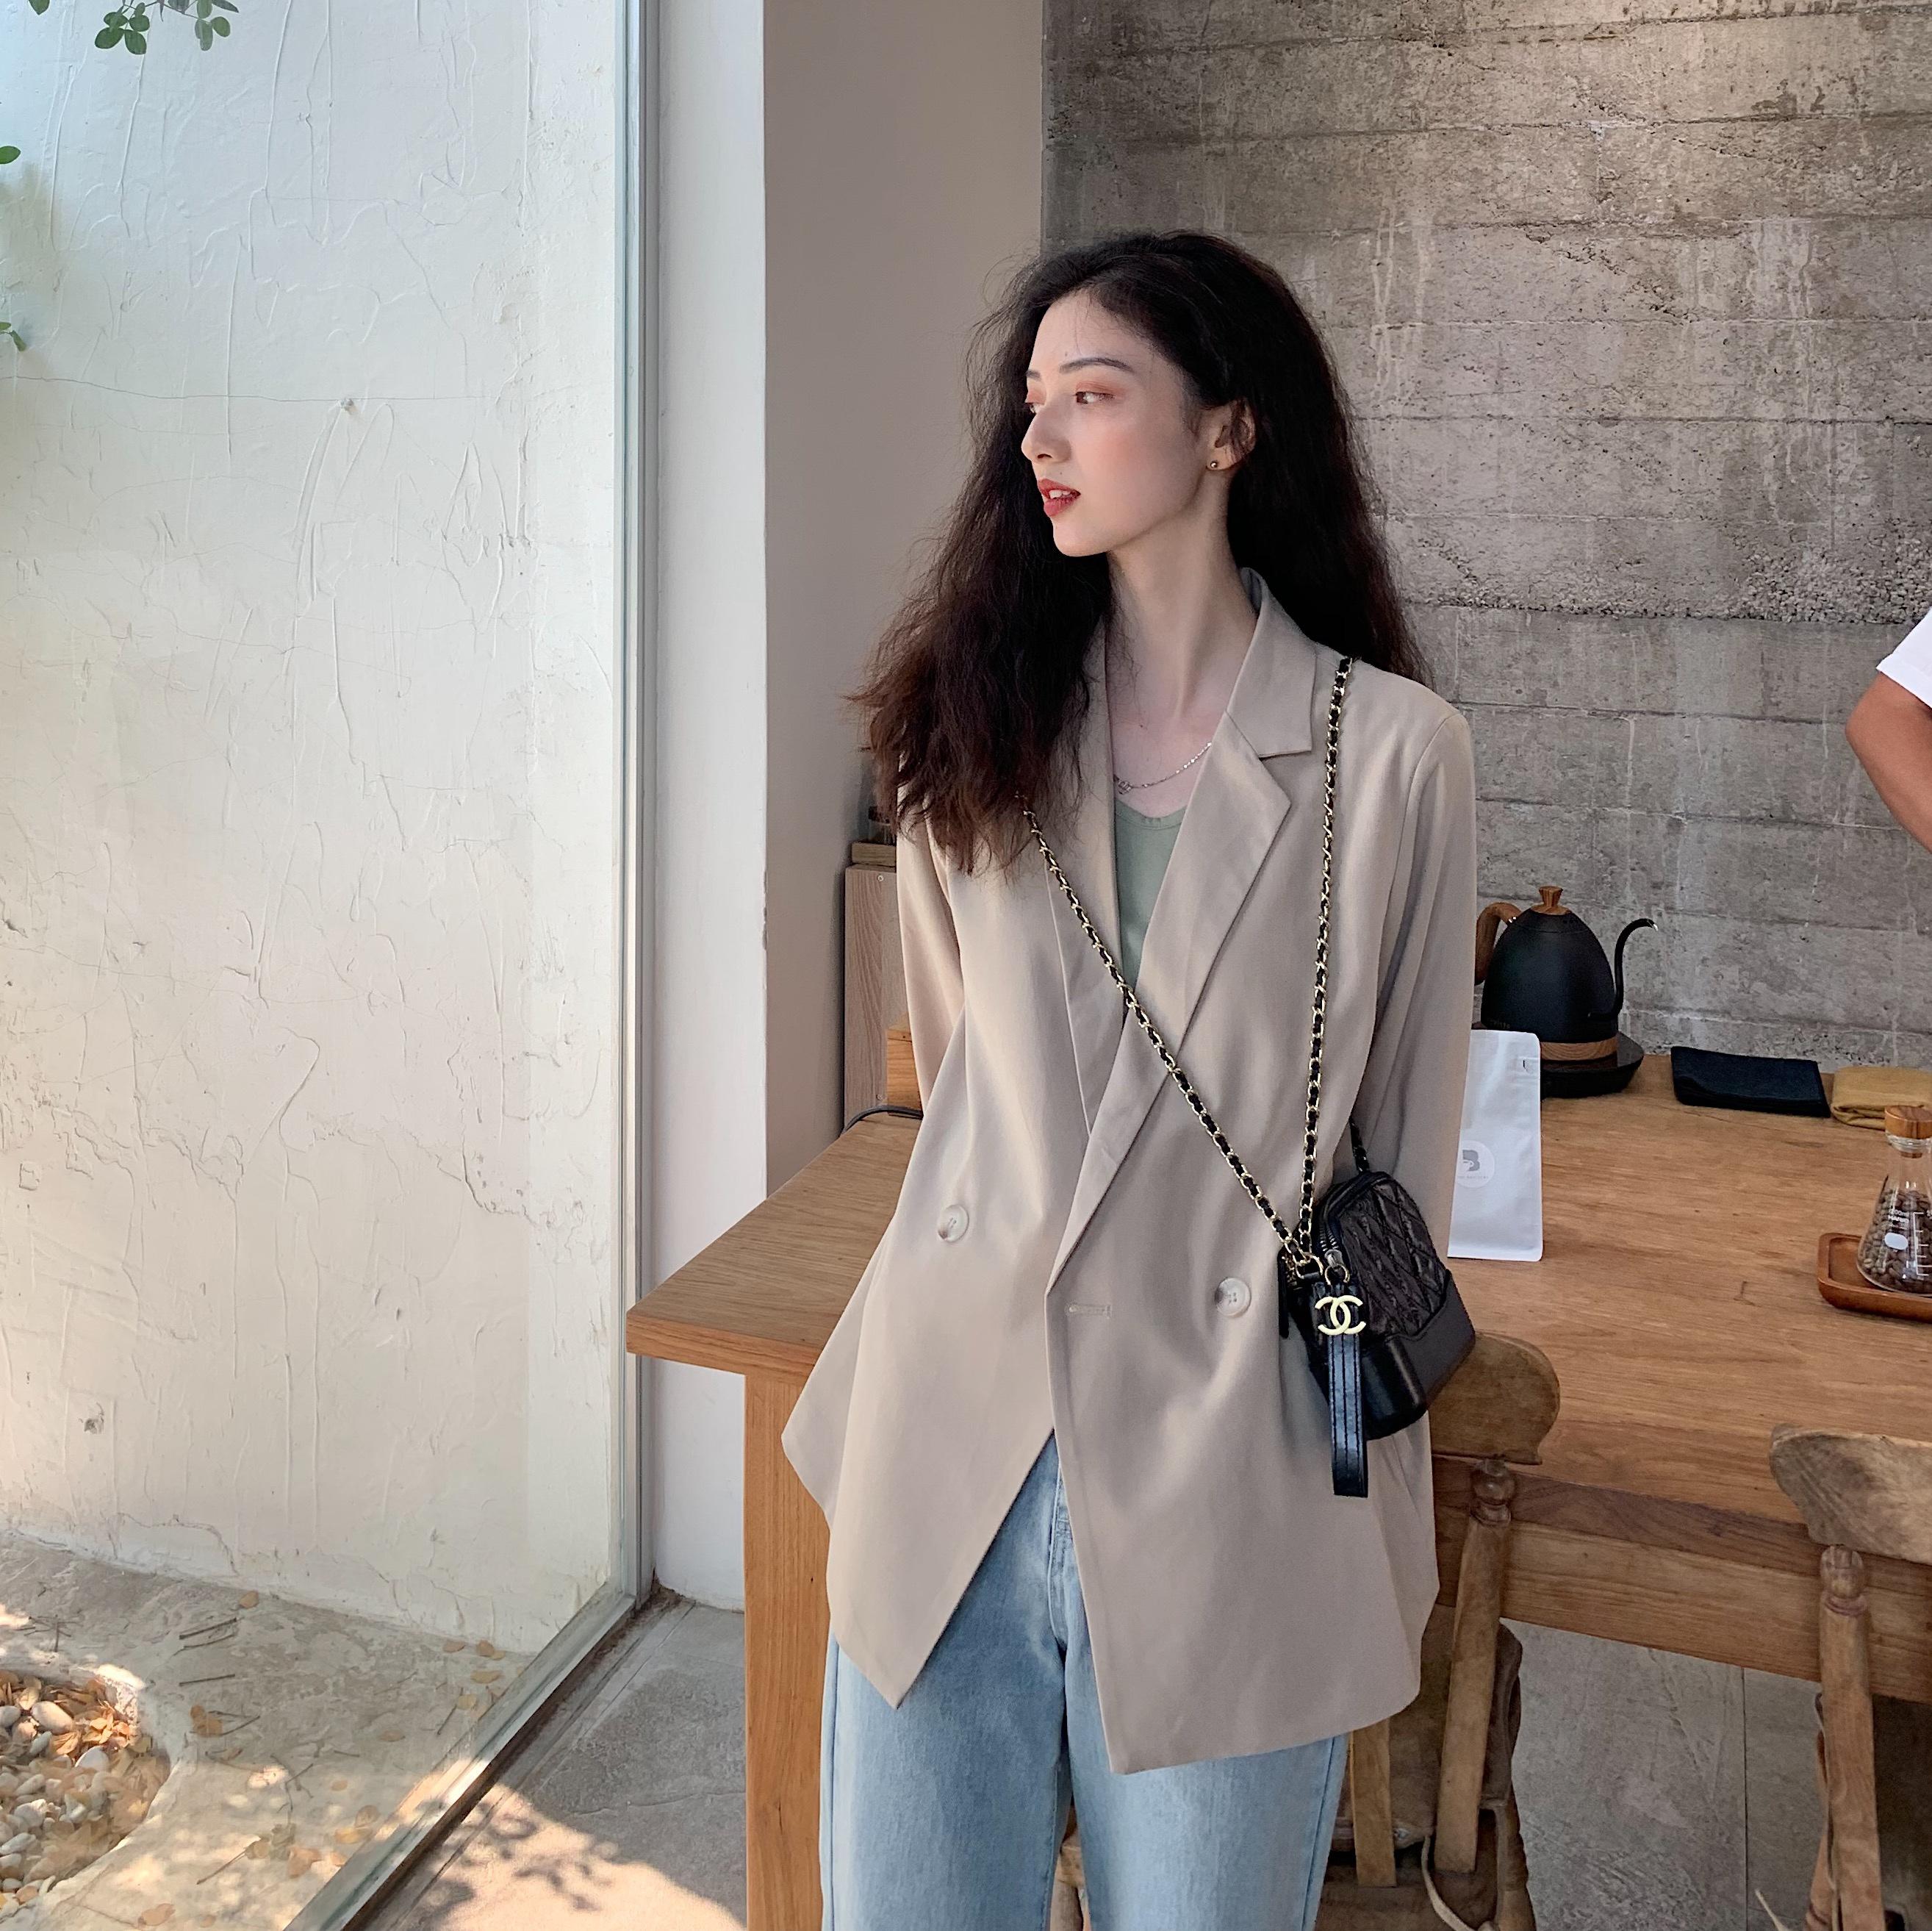 fullmoon薄款西装短外套女2019夏季新款韩版宽松显瘦chic小西服